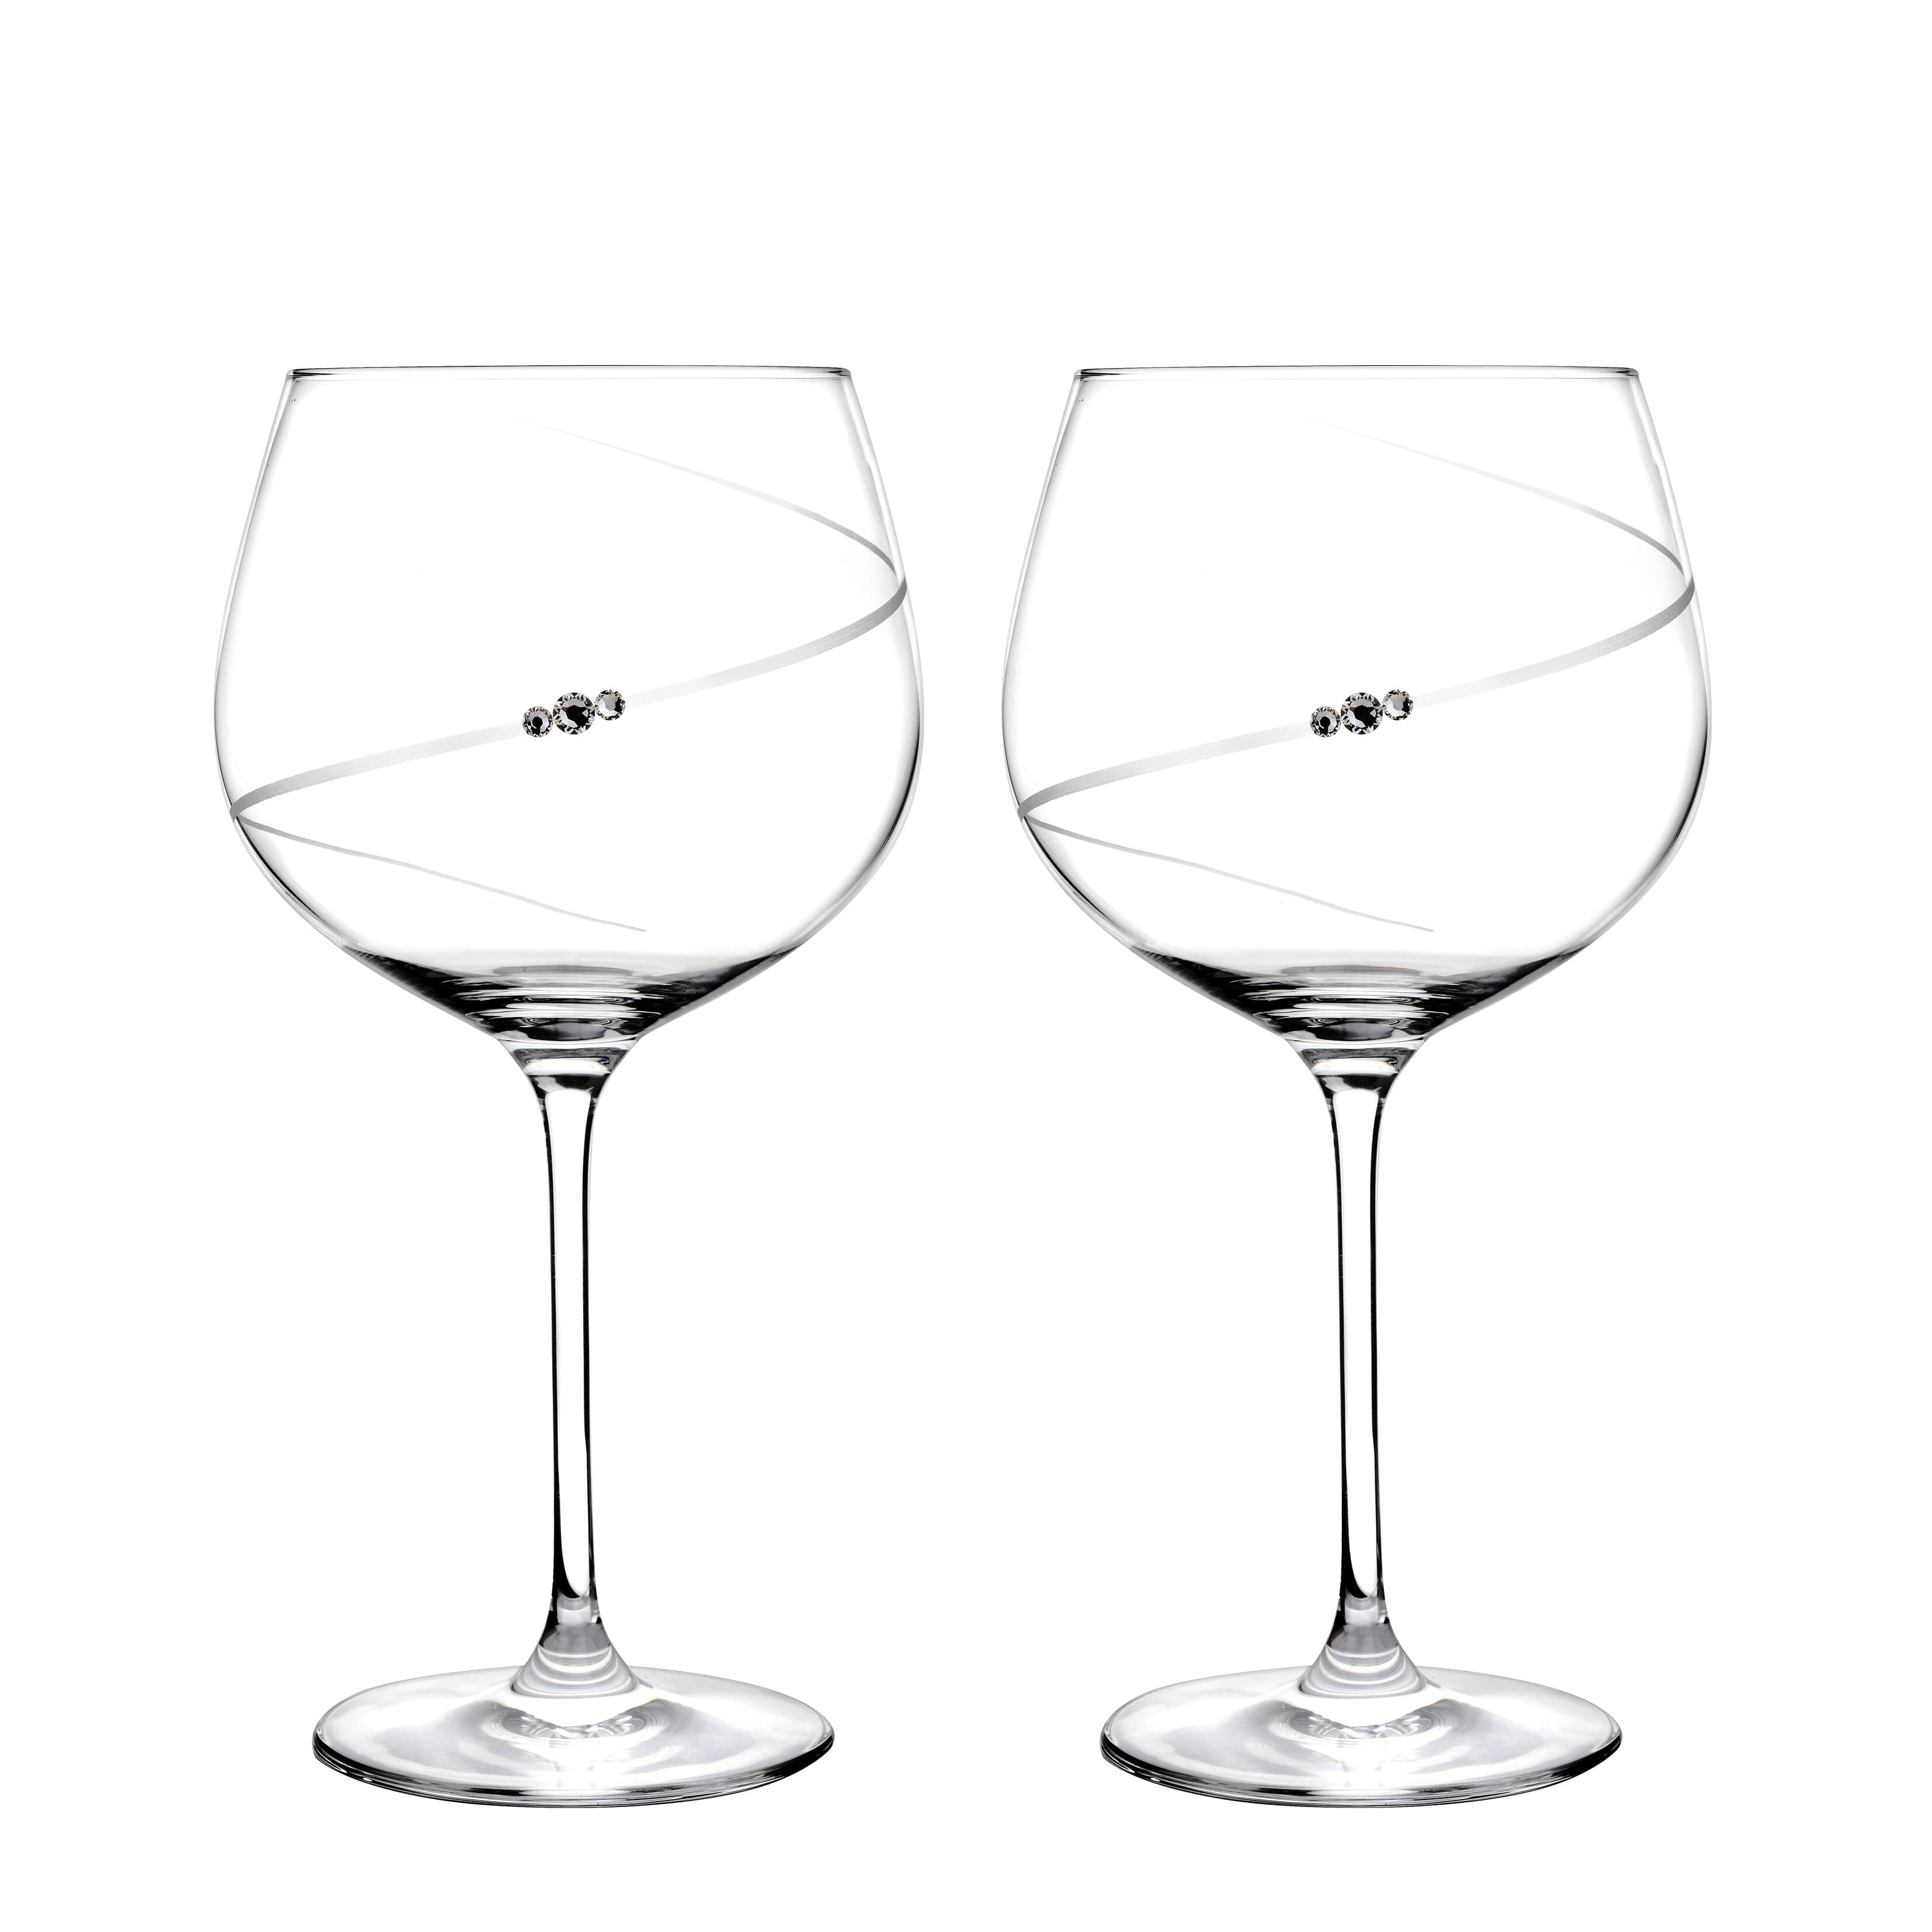 Portmeirion Set of 2 Champagne Glasses